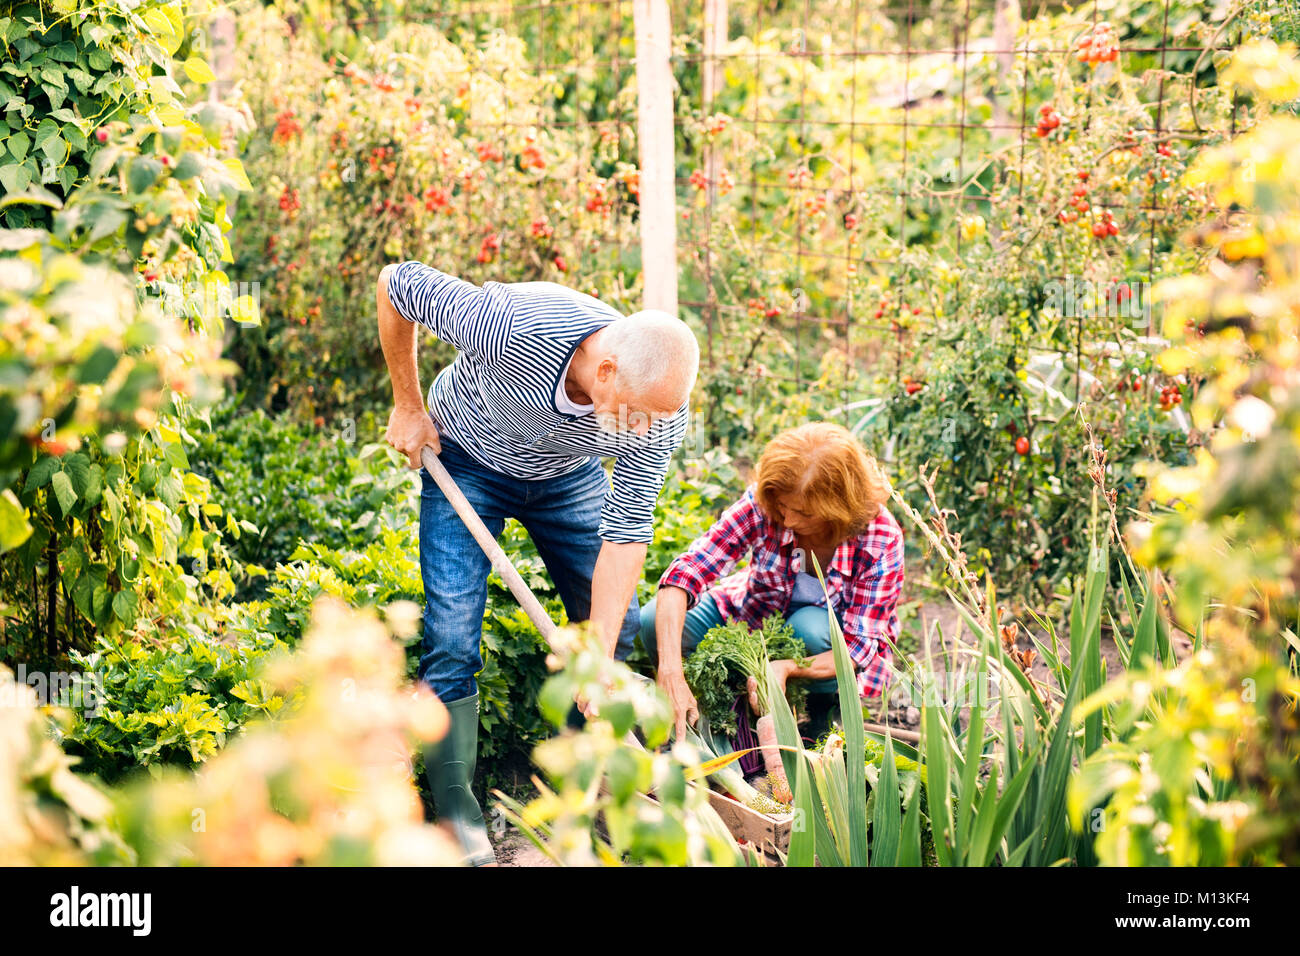 Senior couple jardinage dans le jardin. Photo Stock